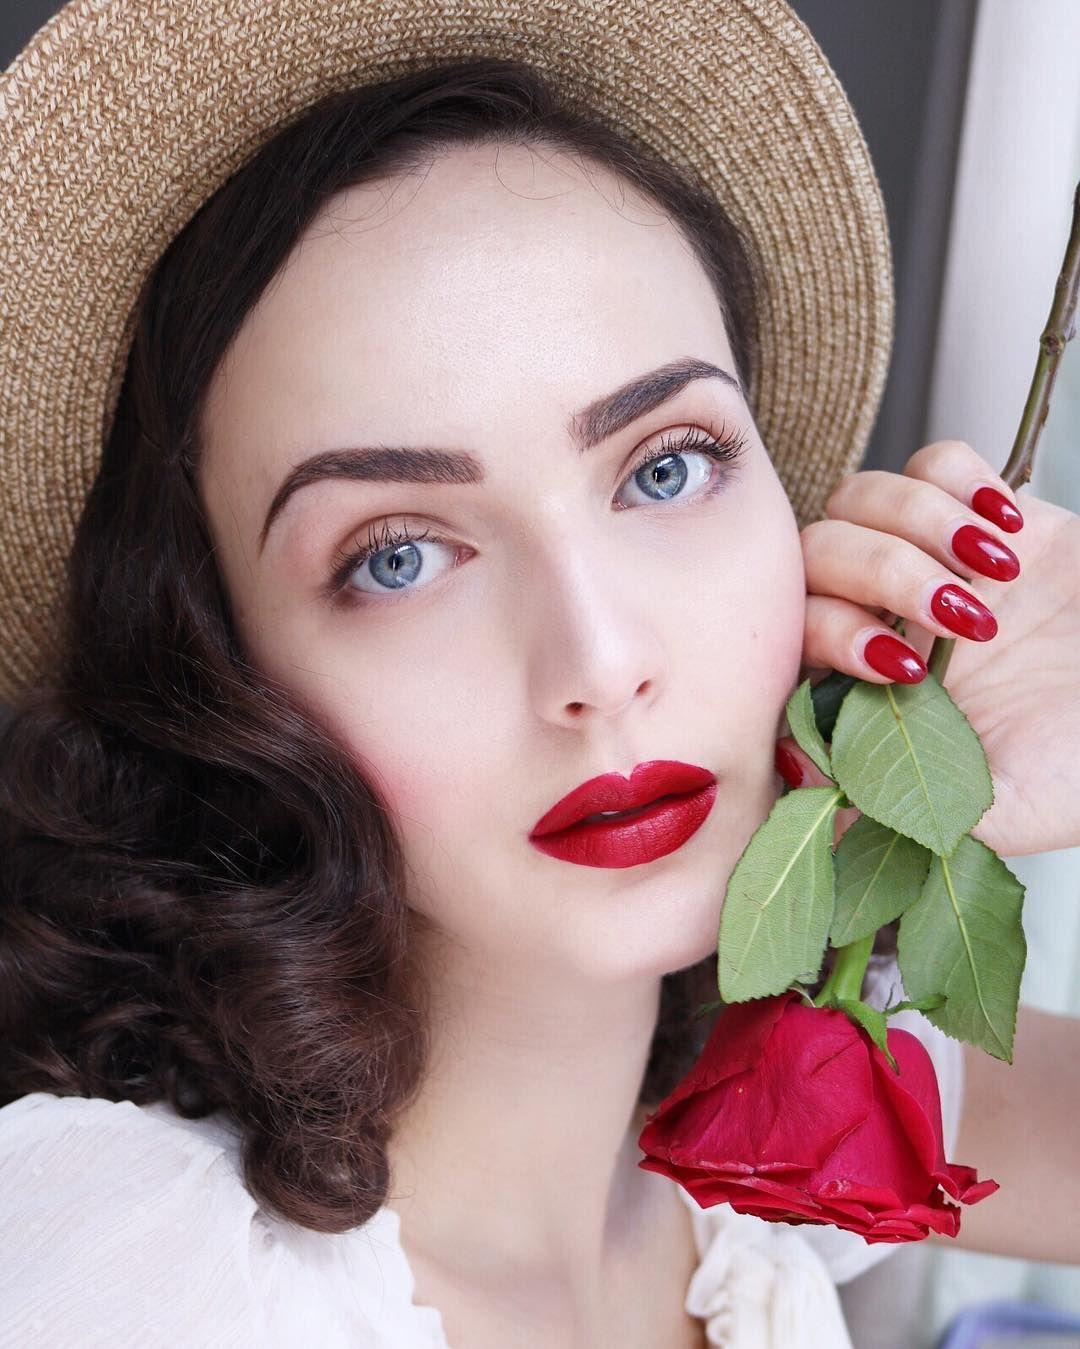 Idda van Munster Instagram: Kissed by a Rose